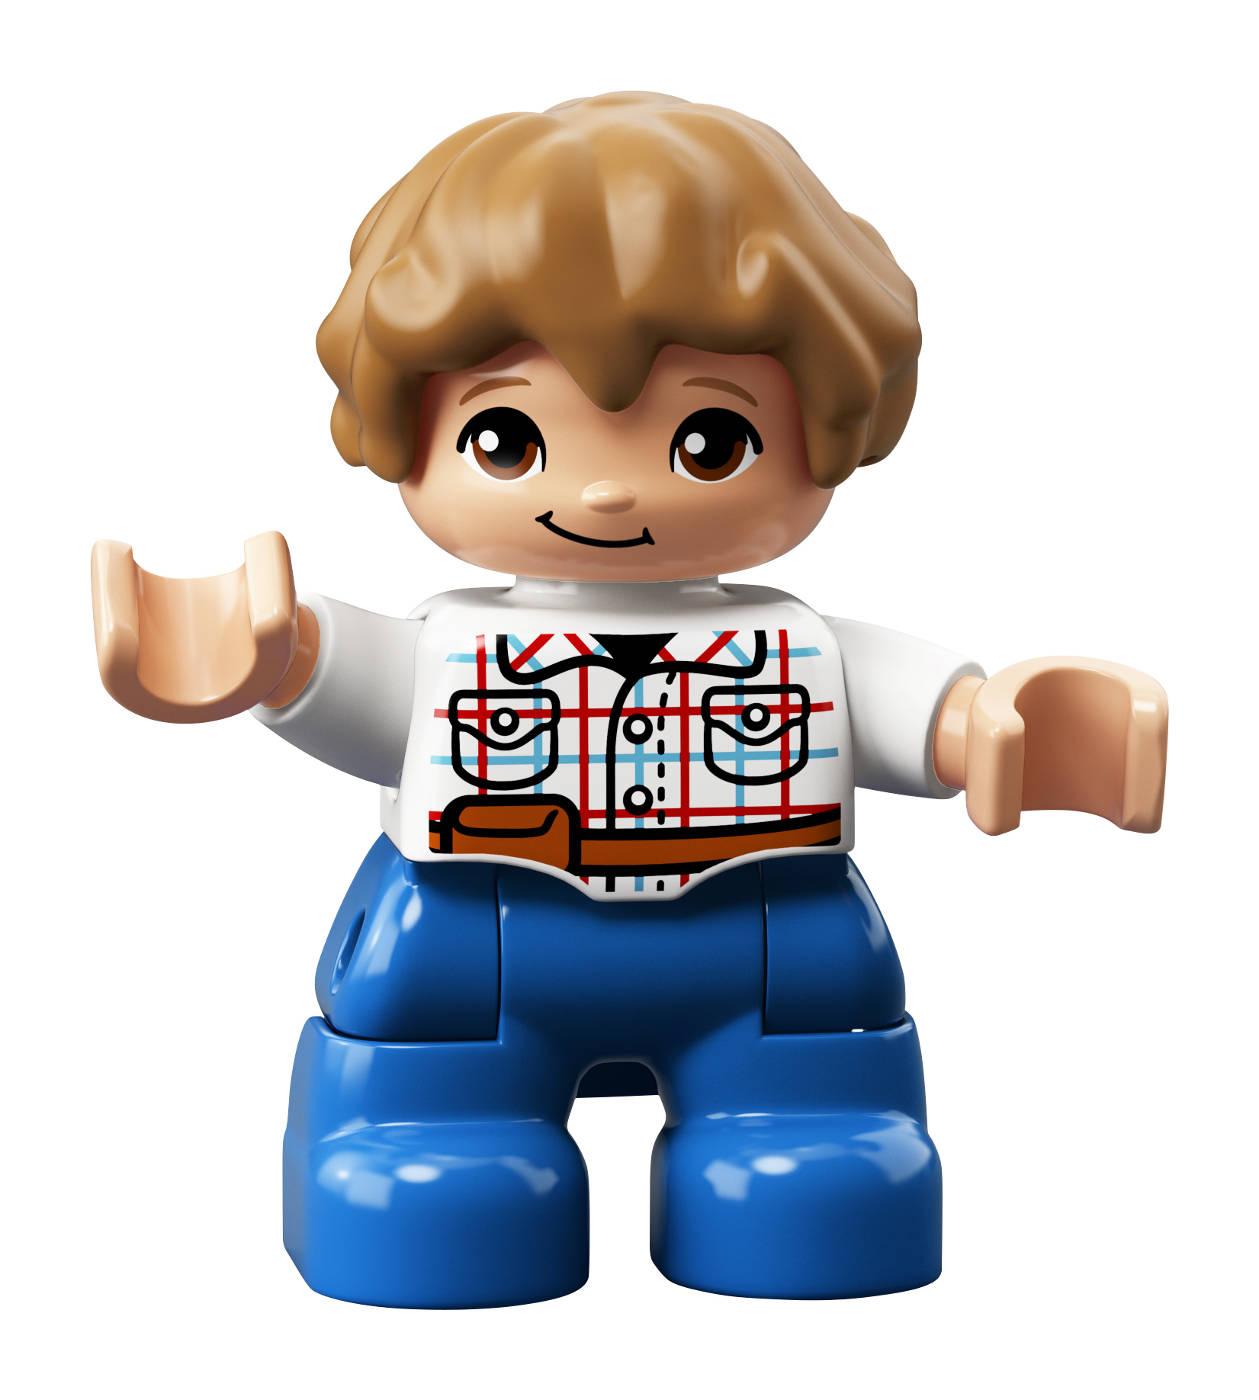 LEGO Reveals More Jurassic World Sets